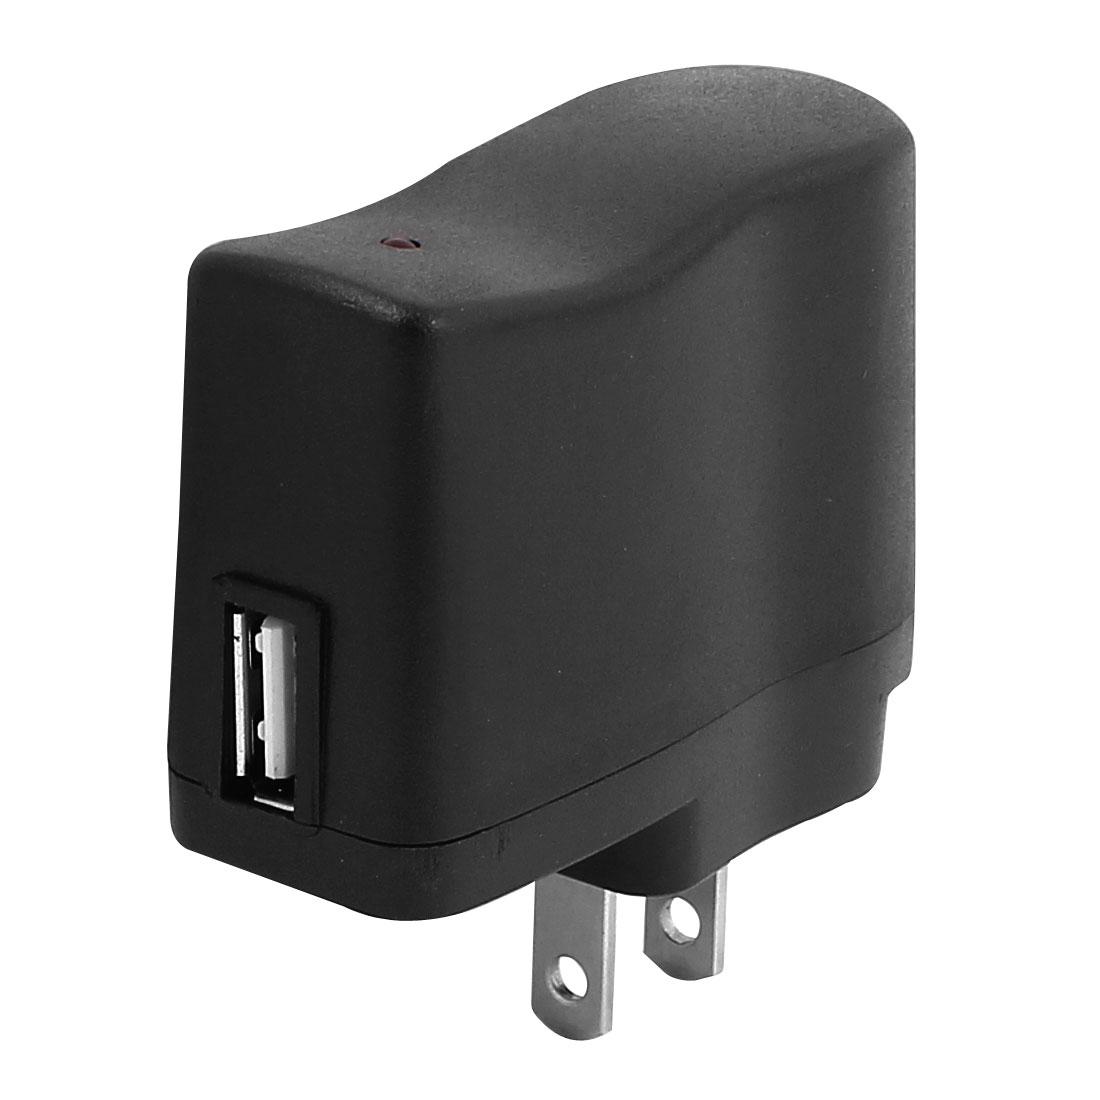 US Plug AC 100V-240V to DC 5V USB2.0 Power Supply Adapter Converter Charger